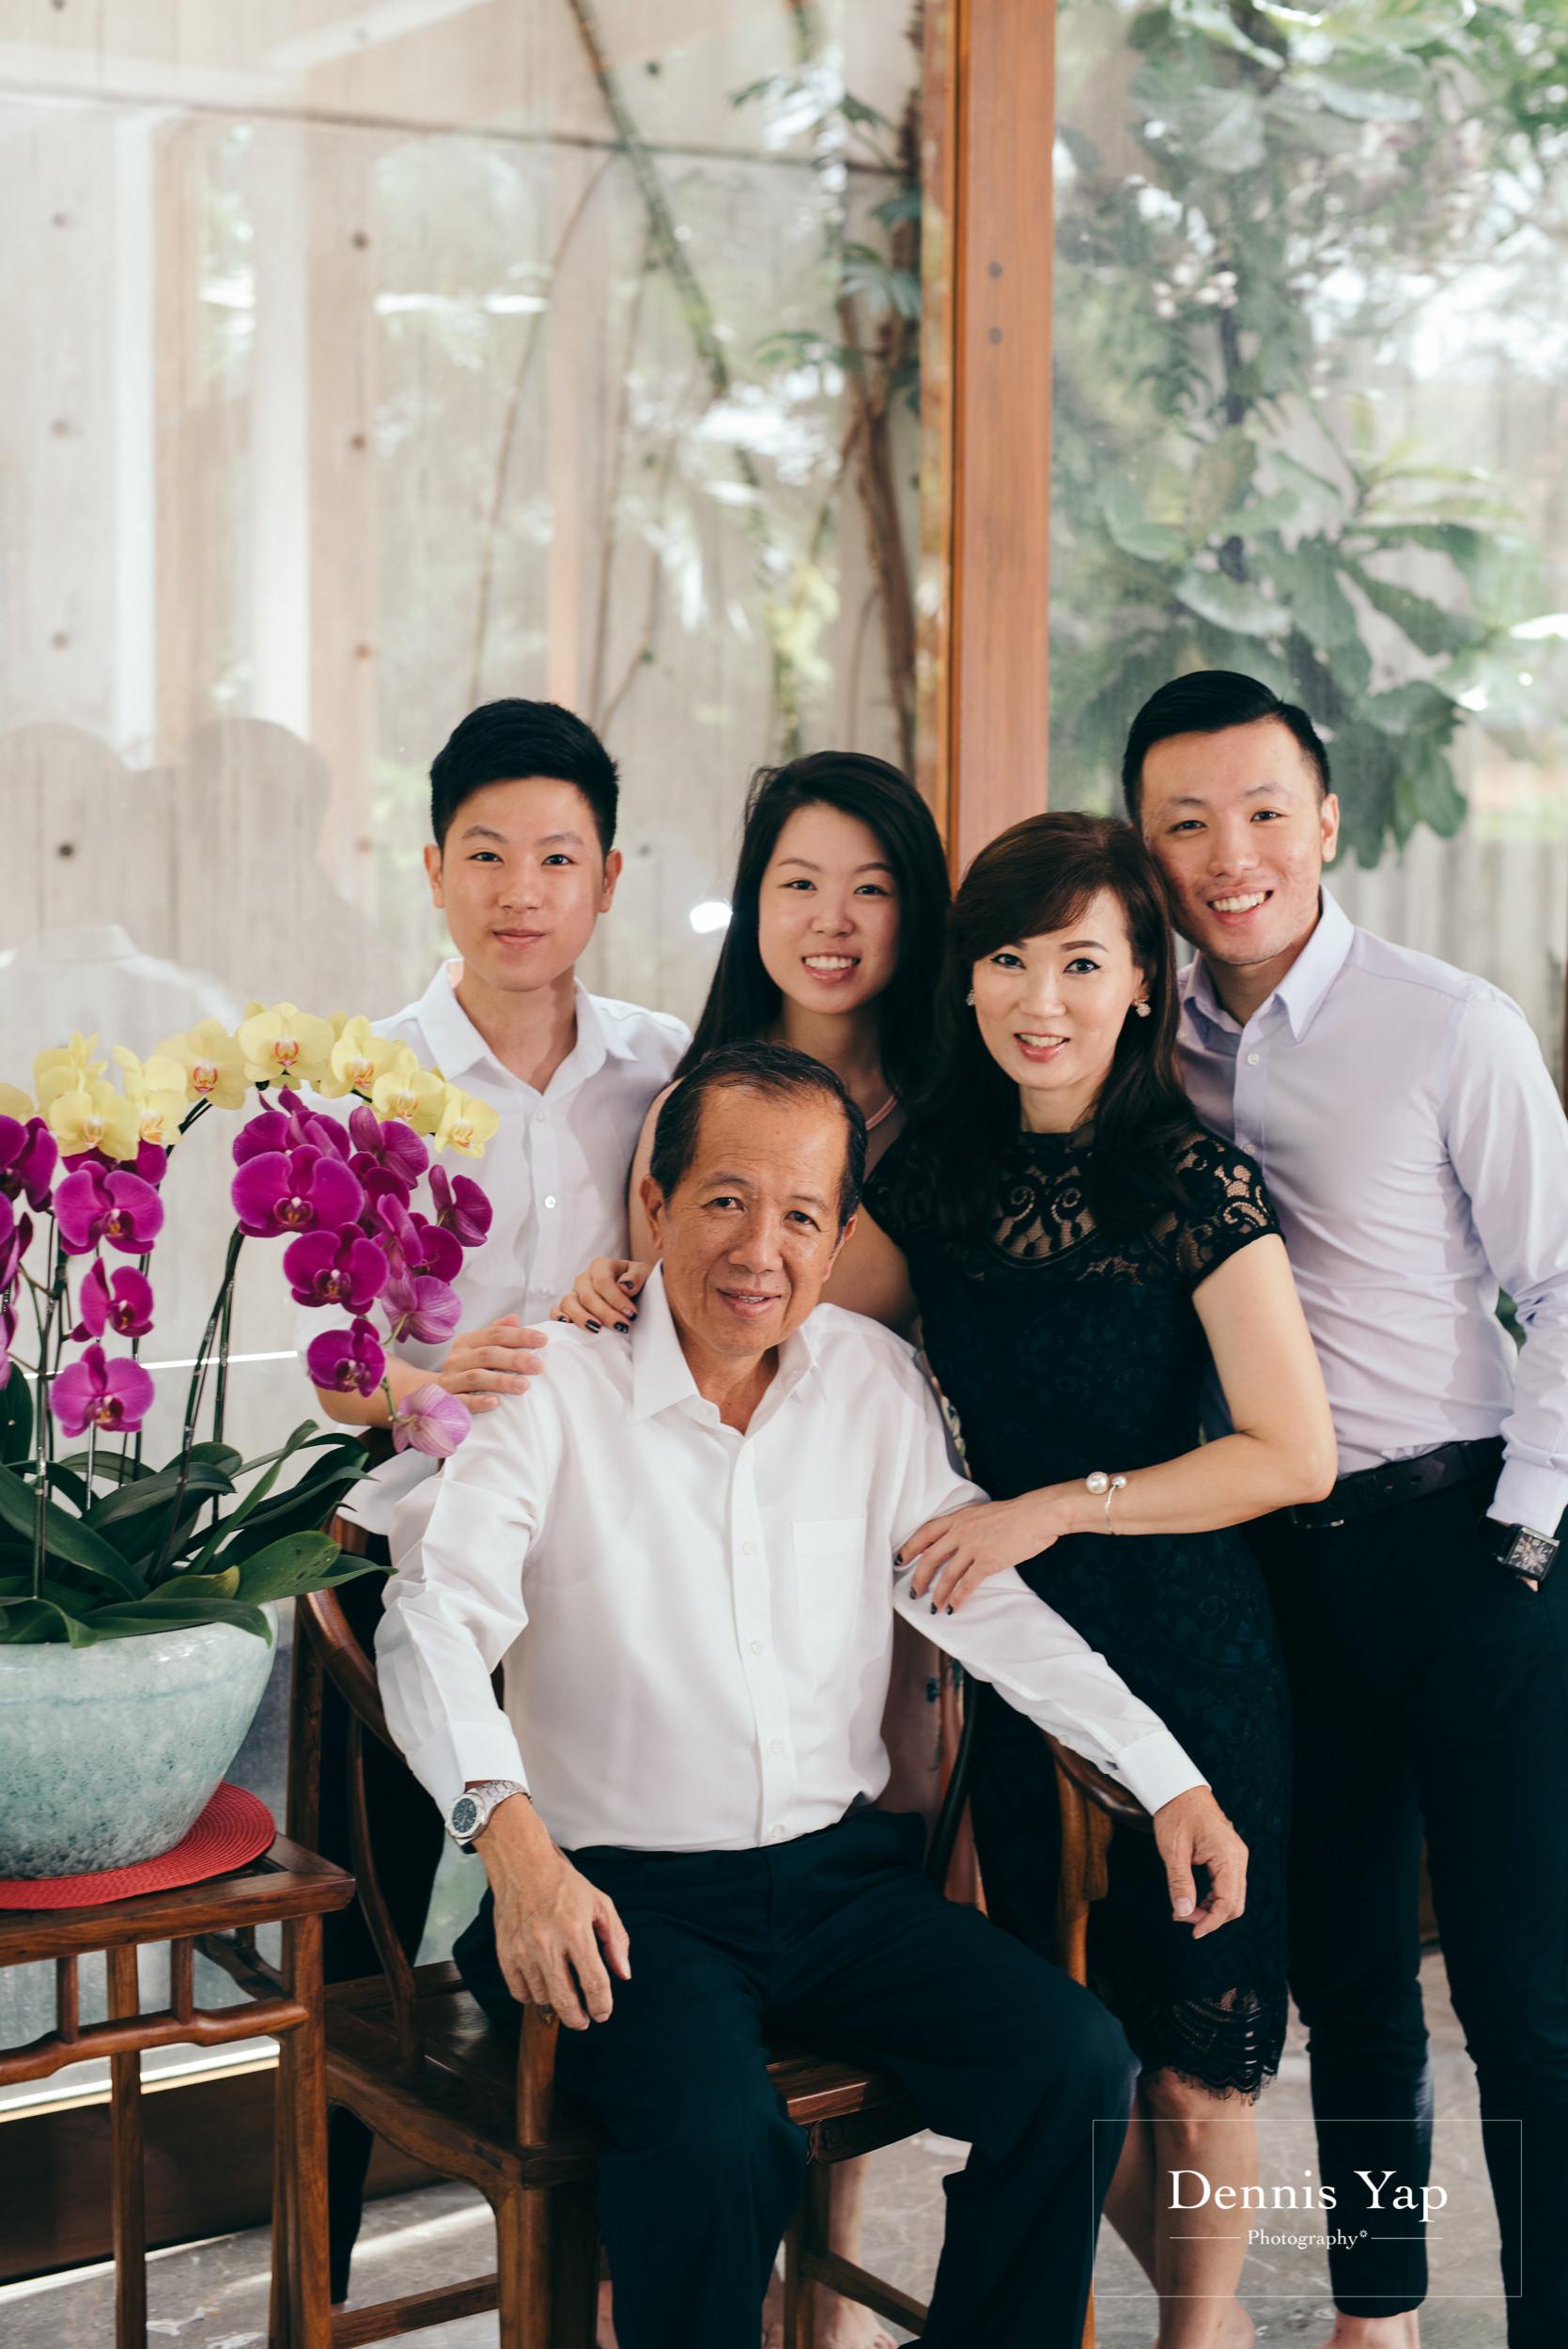 joanna family portrait luxury casual candid family portrait dennis yap photography-1.jpg